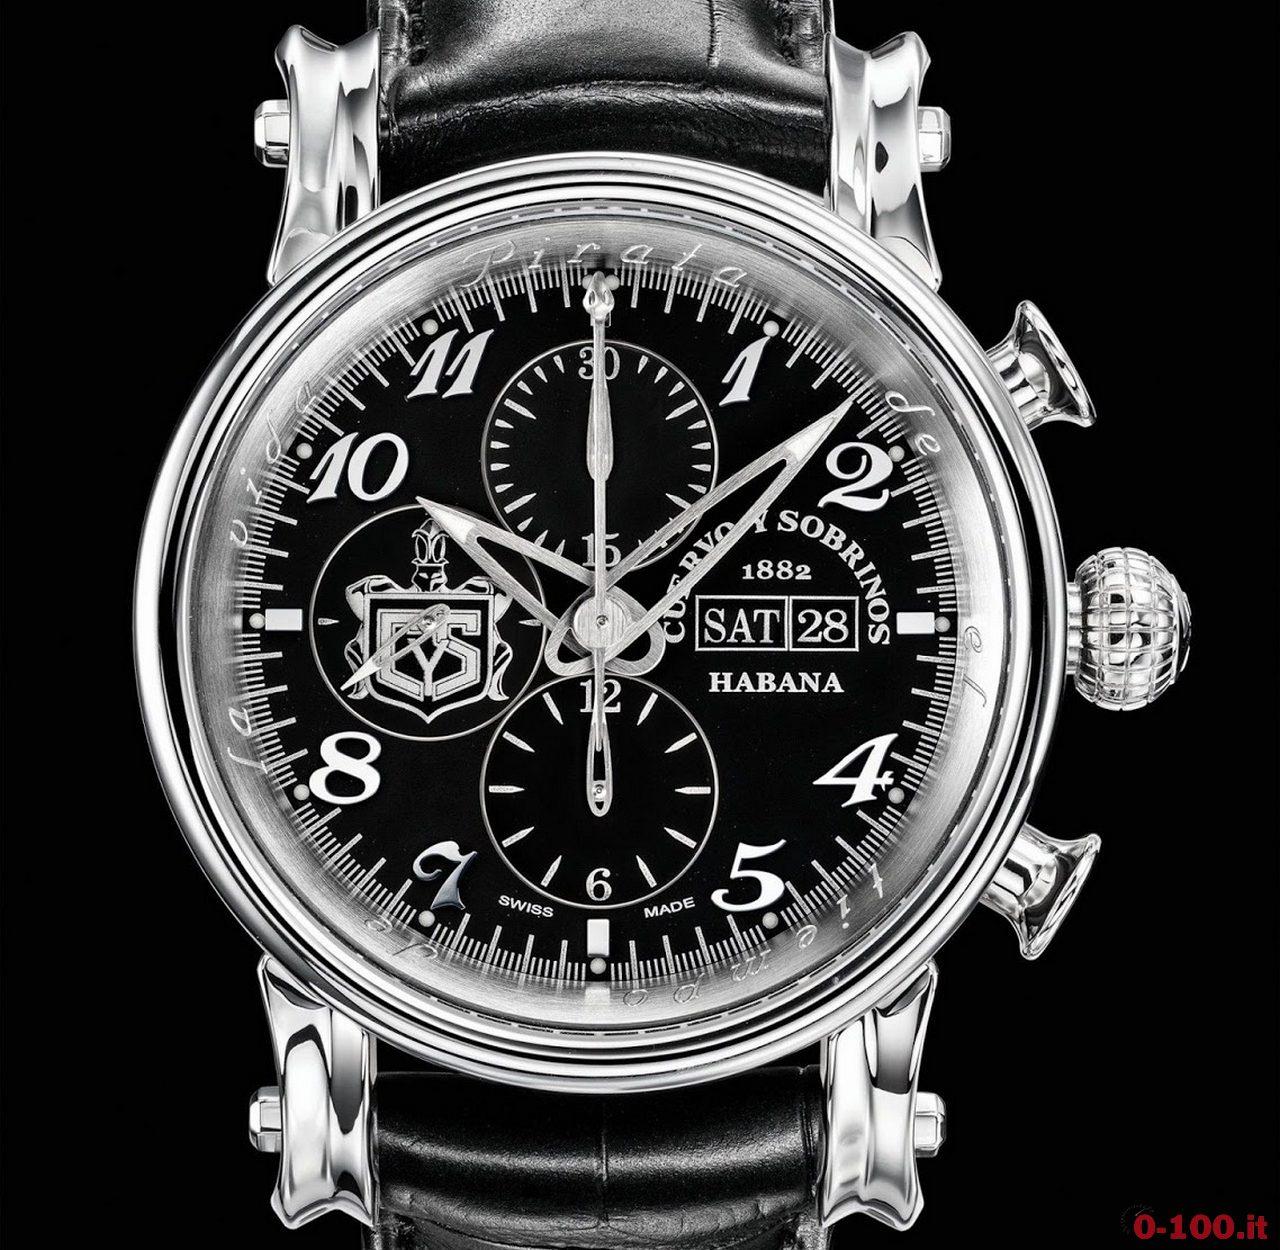 antreprima-baselworld-2017-cuervo-y-sobrinos-torpedo-pirata-chrono-day-date-prezzo-price_0-1002